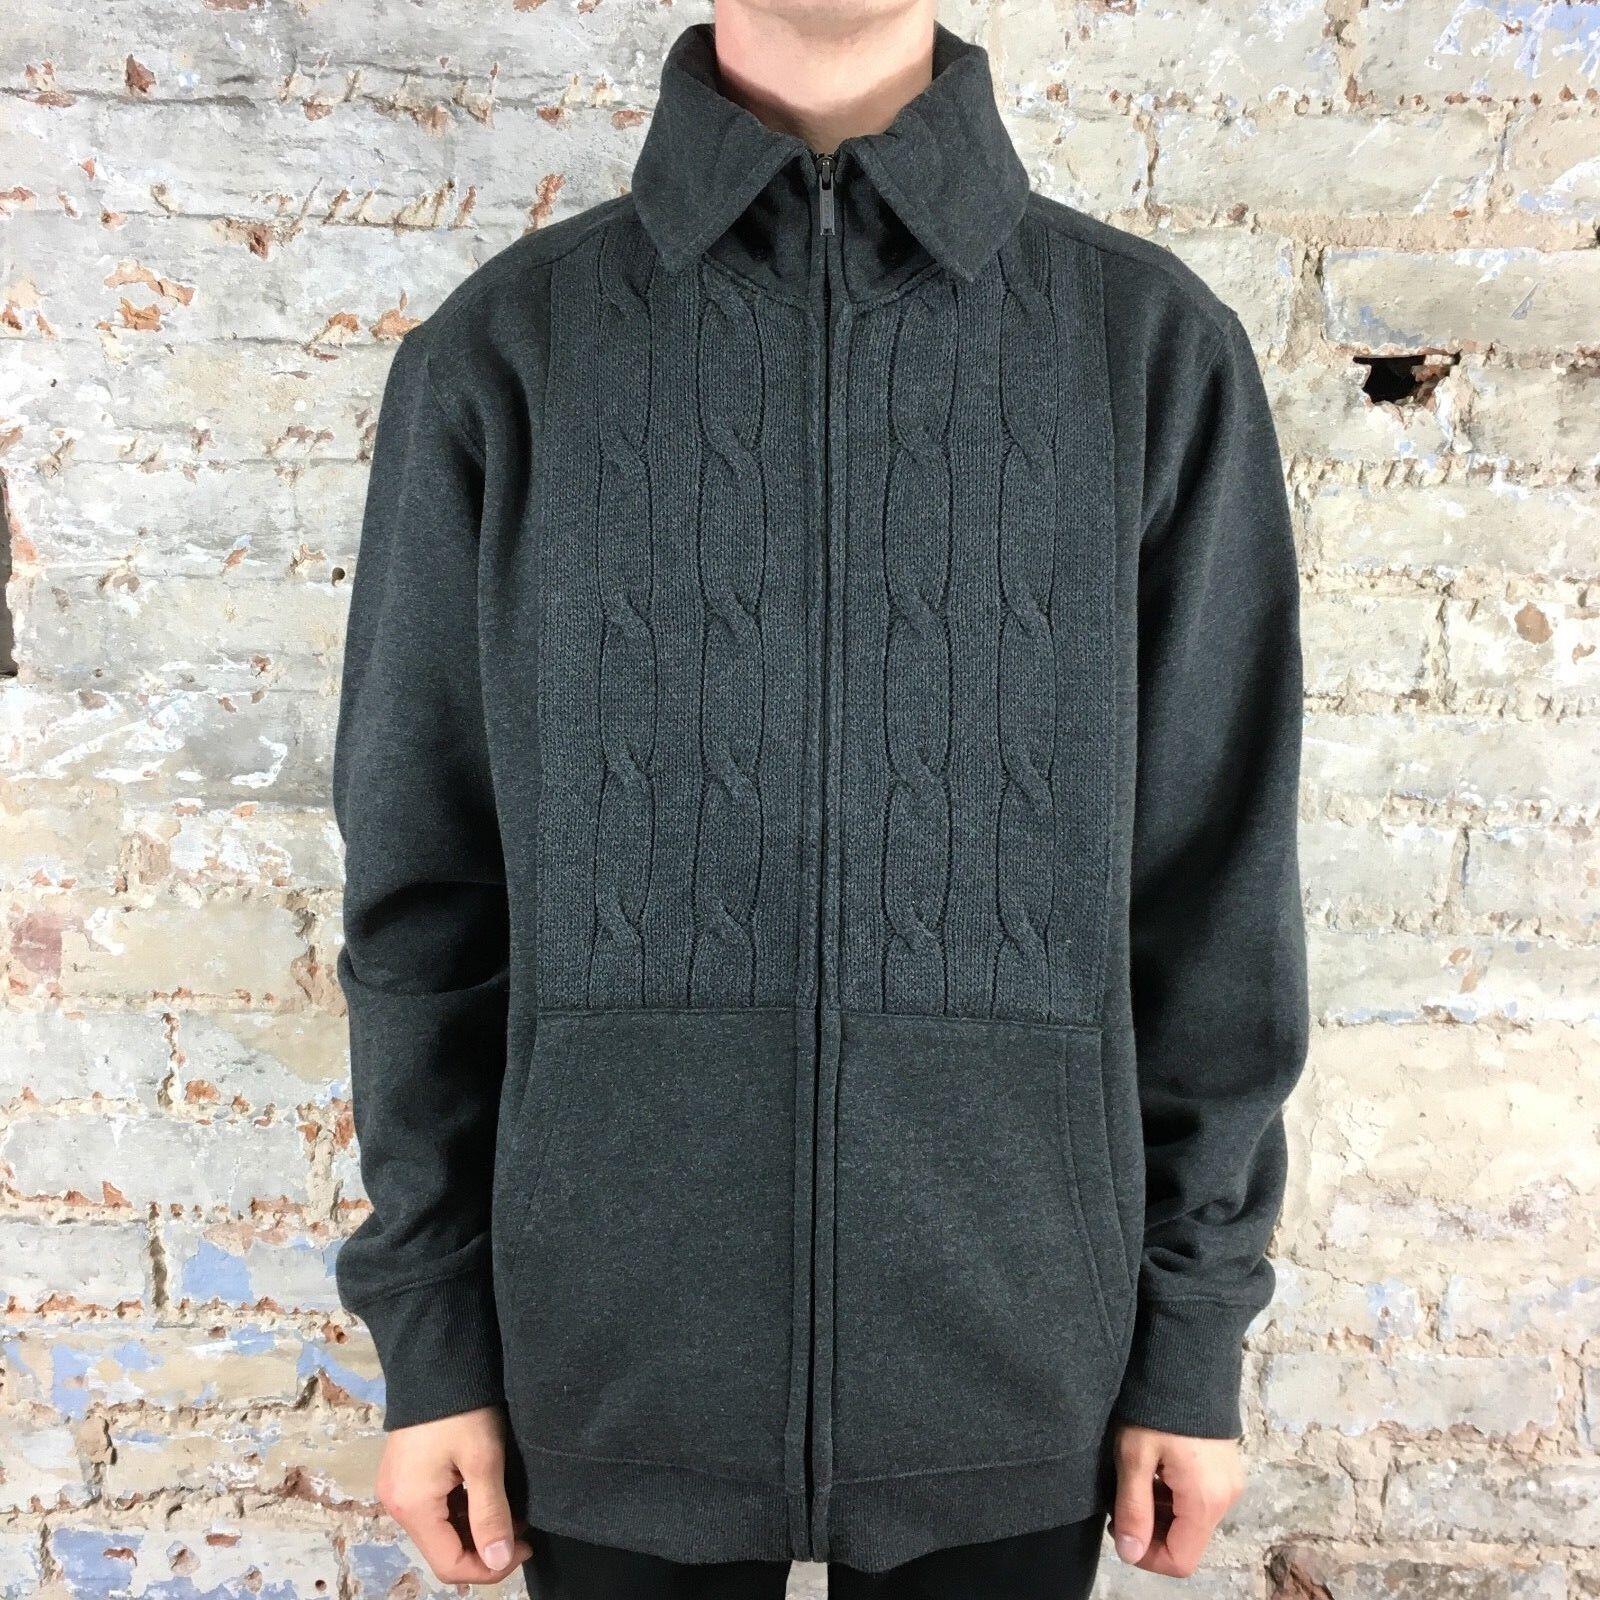 Insight Decapollosus Fleece Sweatshirt Brand New - Größe:S,L,